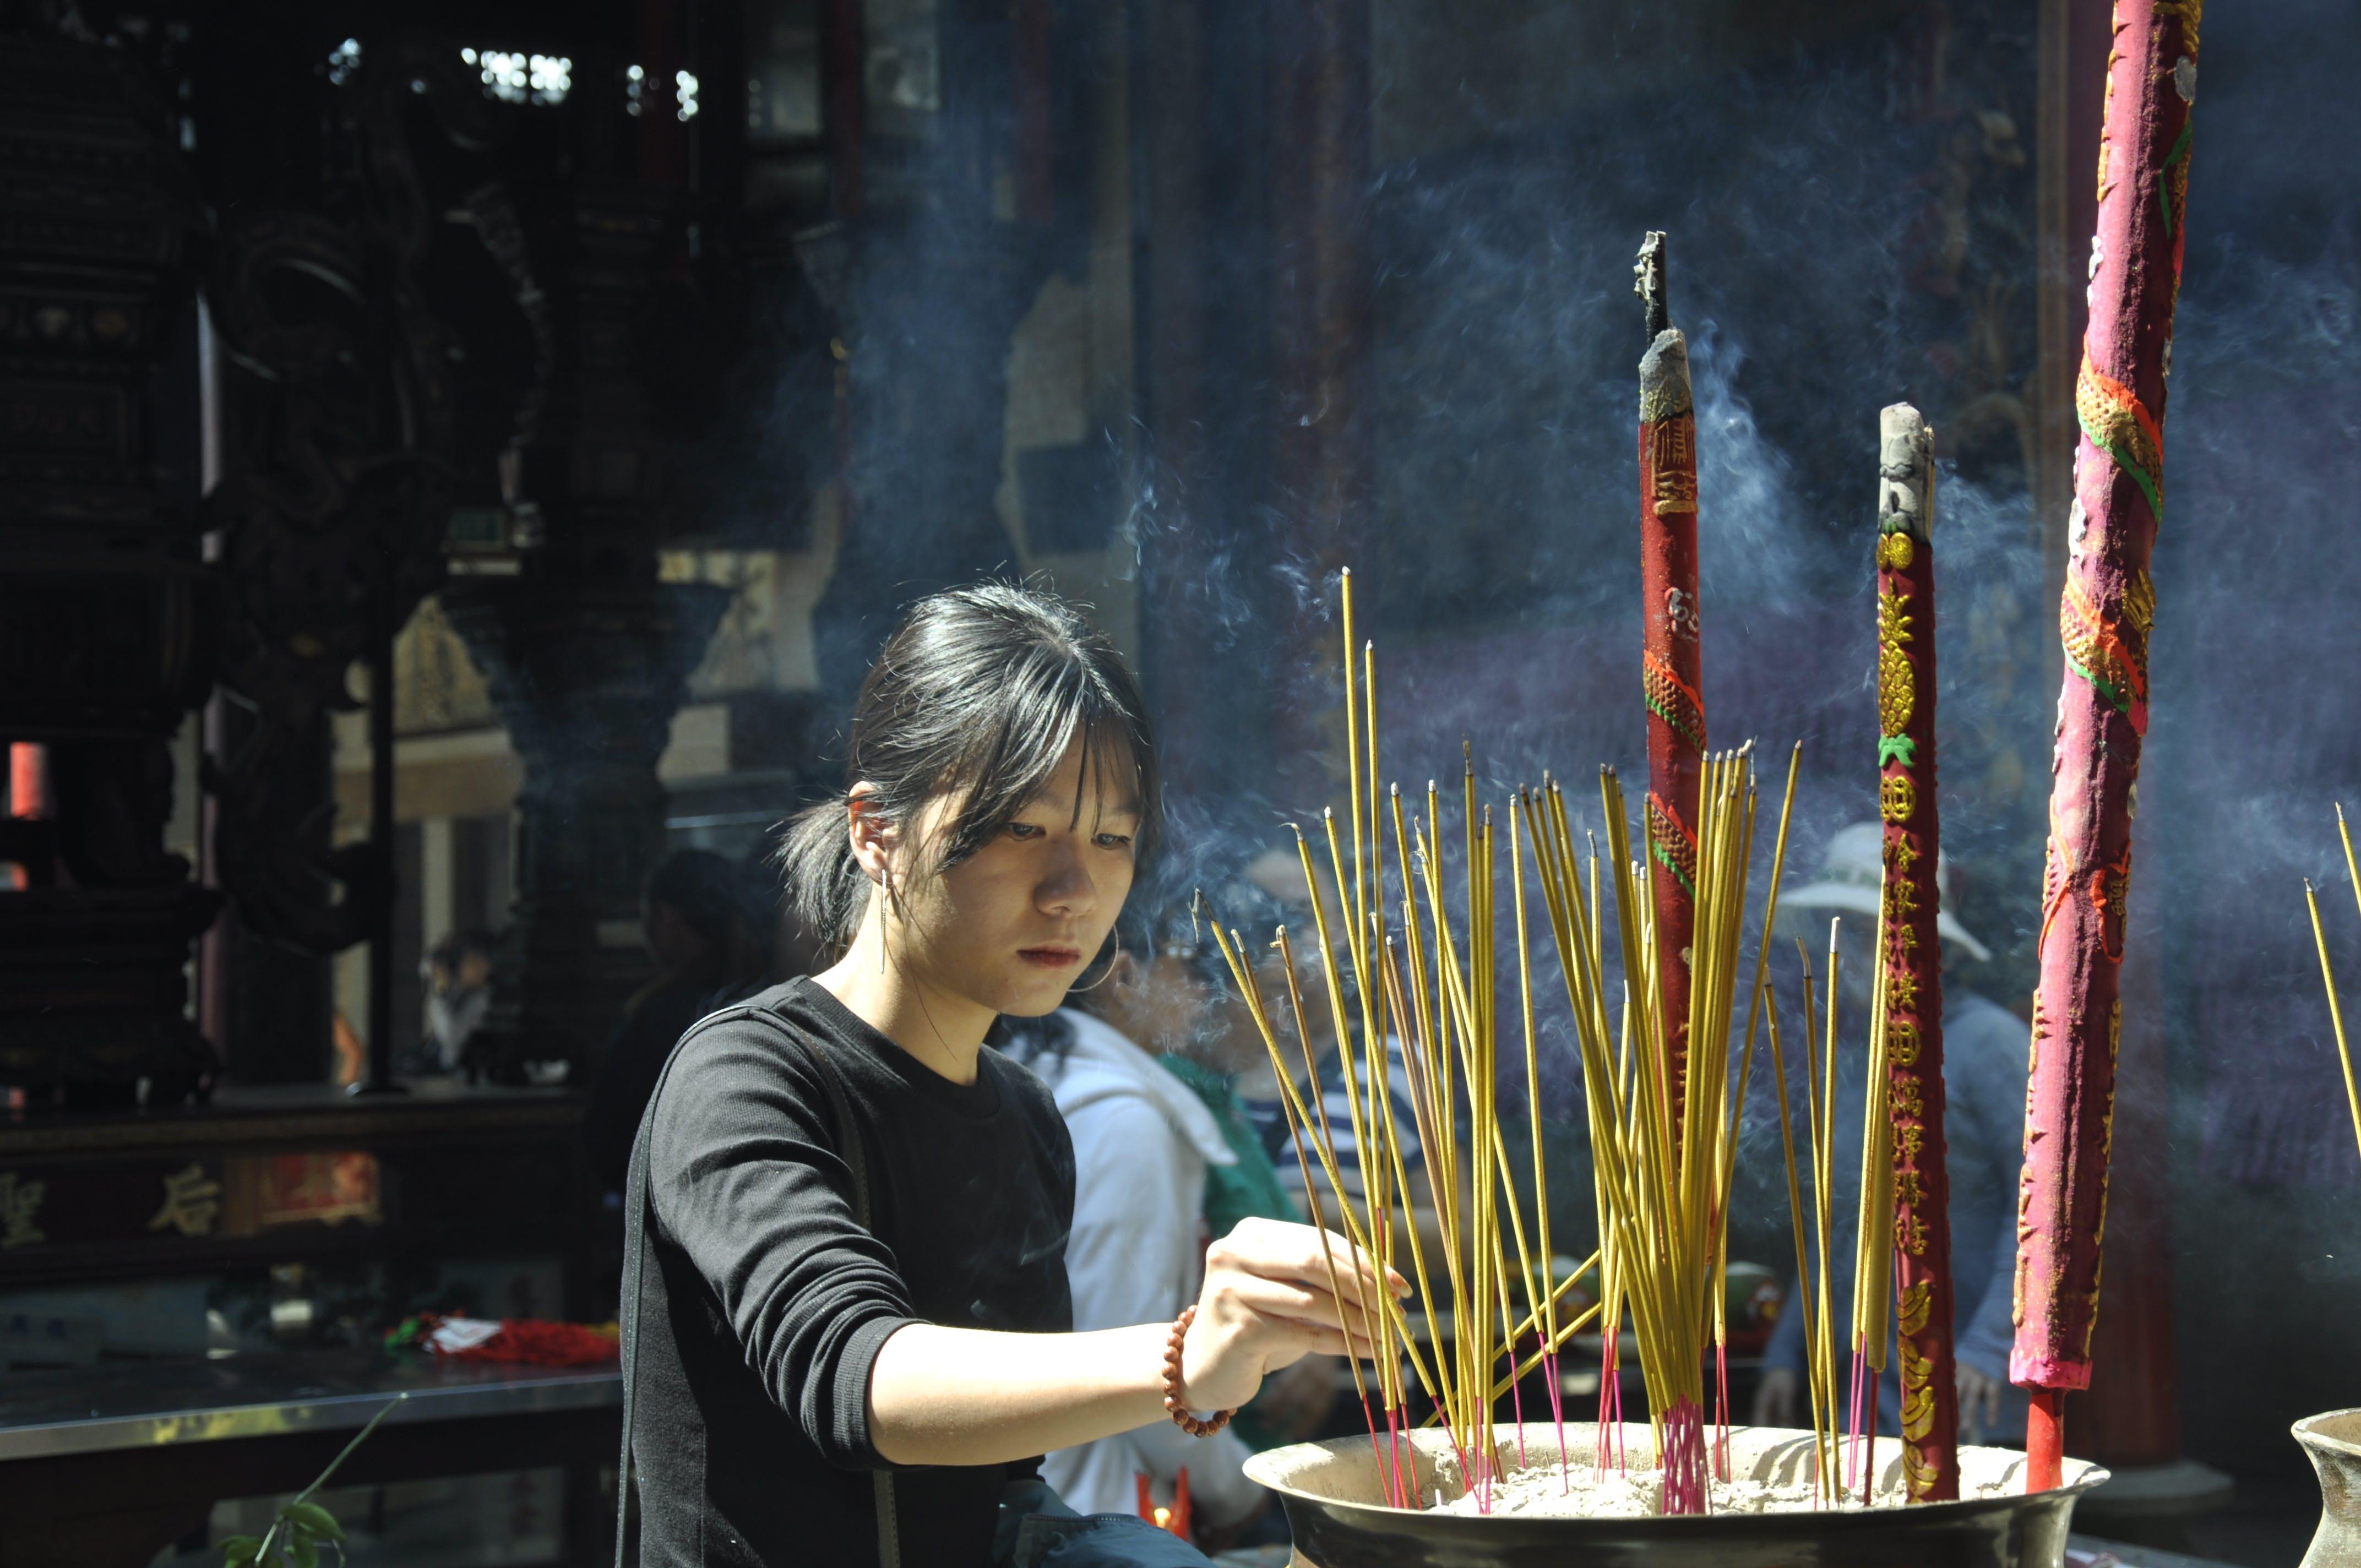 Woman Lighting Incense Sticks